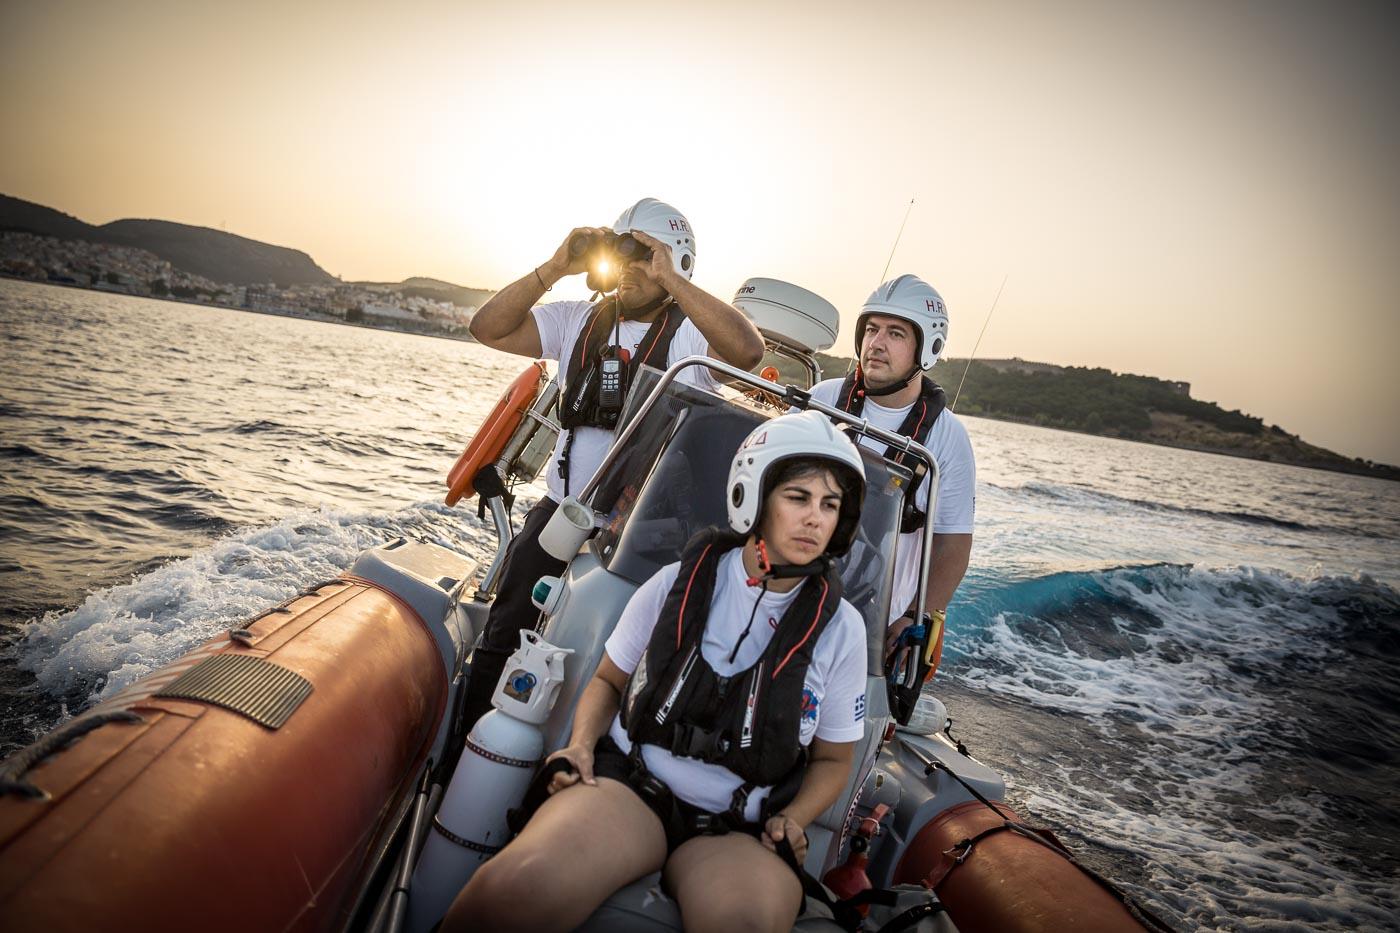 Greece. Winners of UNHCR's Nansen Award 2016, Efi Latsoudi and Konstantinos Mitragas